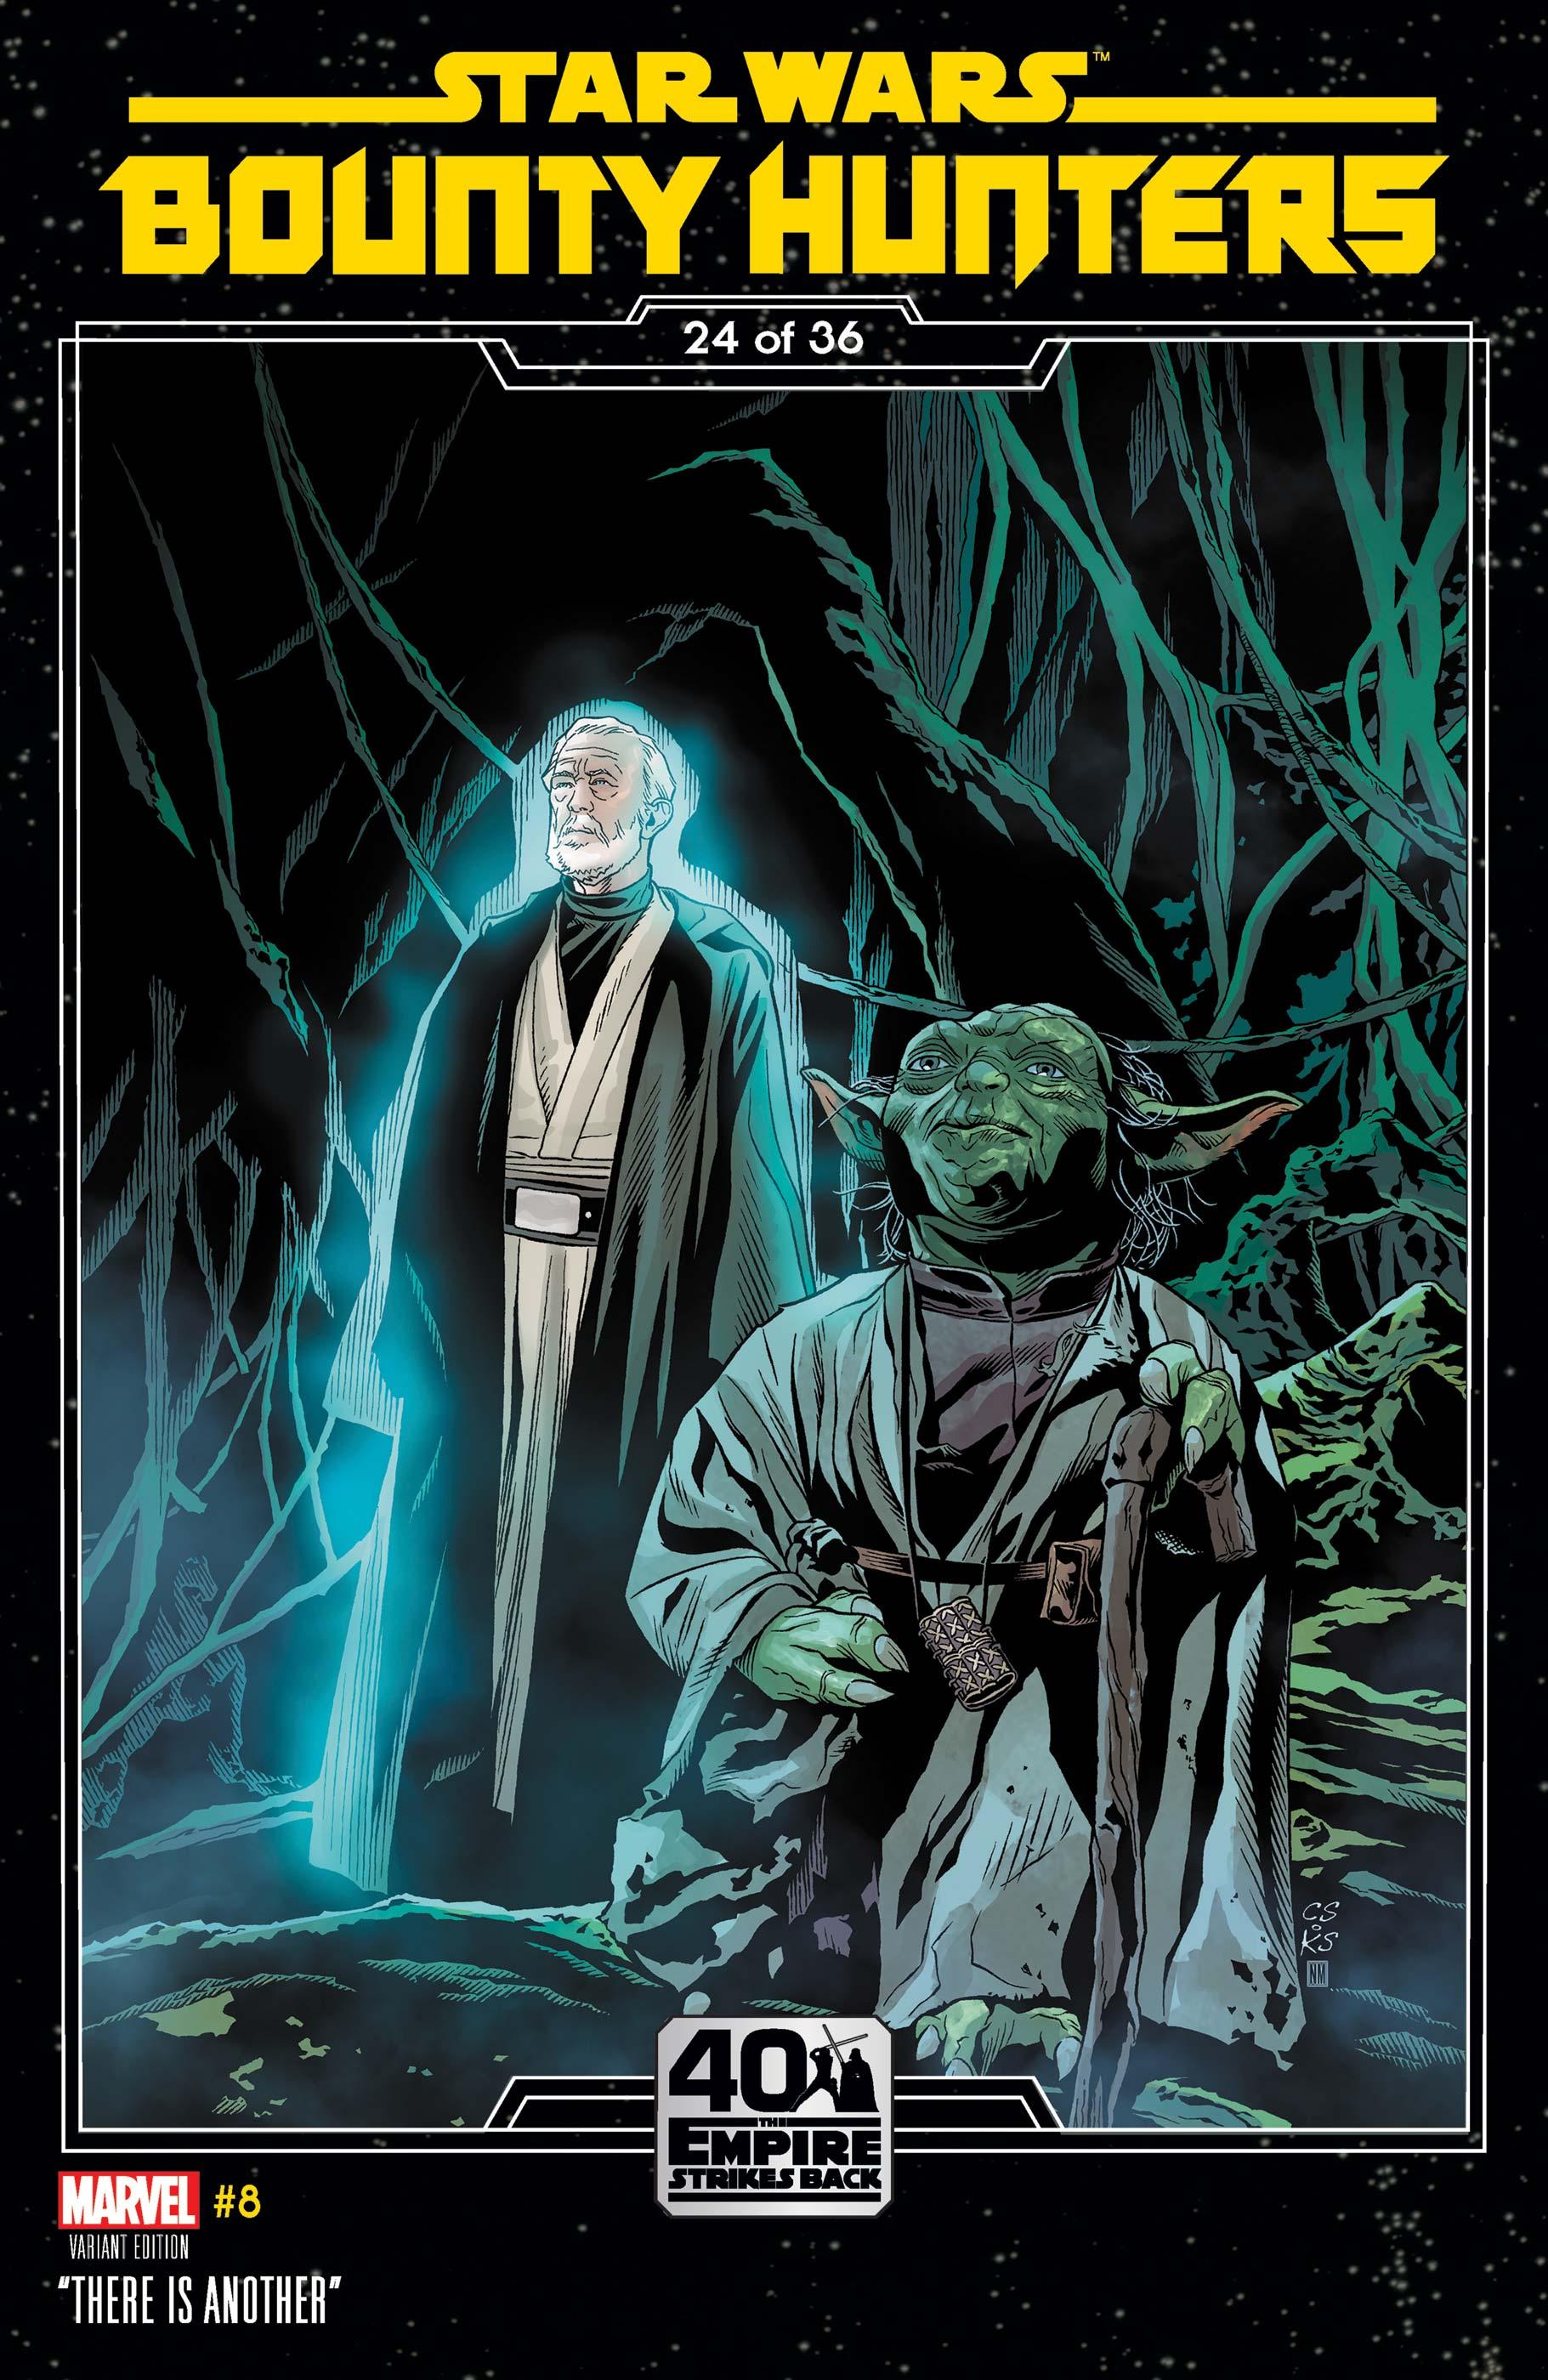 Star Wars: Bounty Hunters (2020) #8 (Variant)